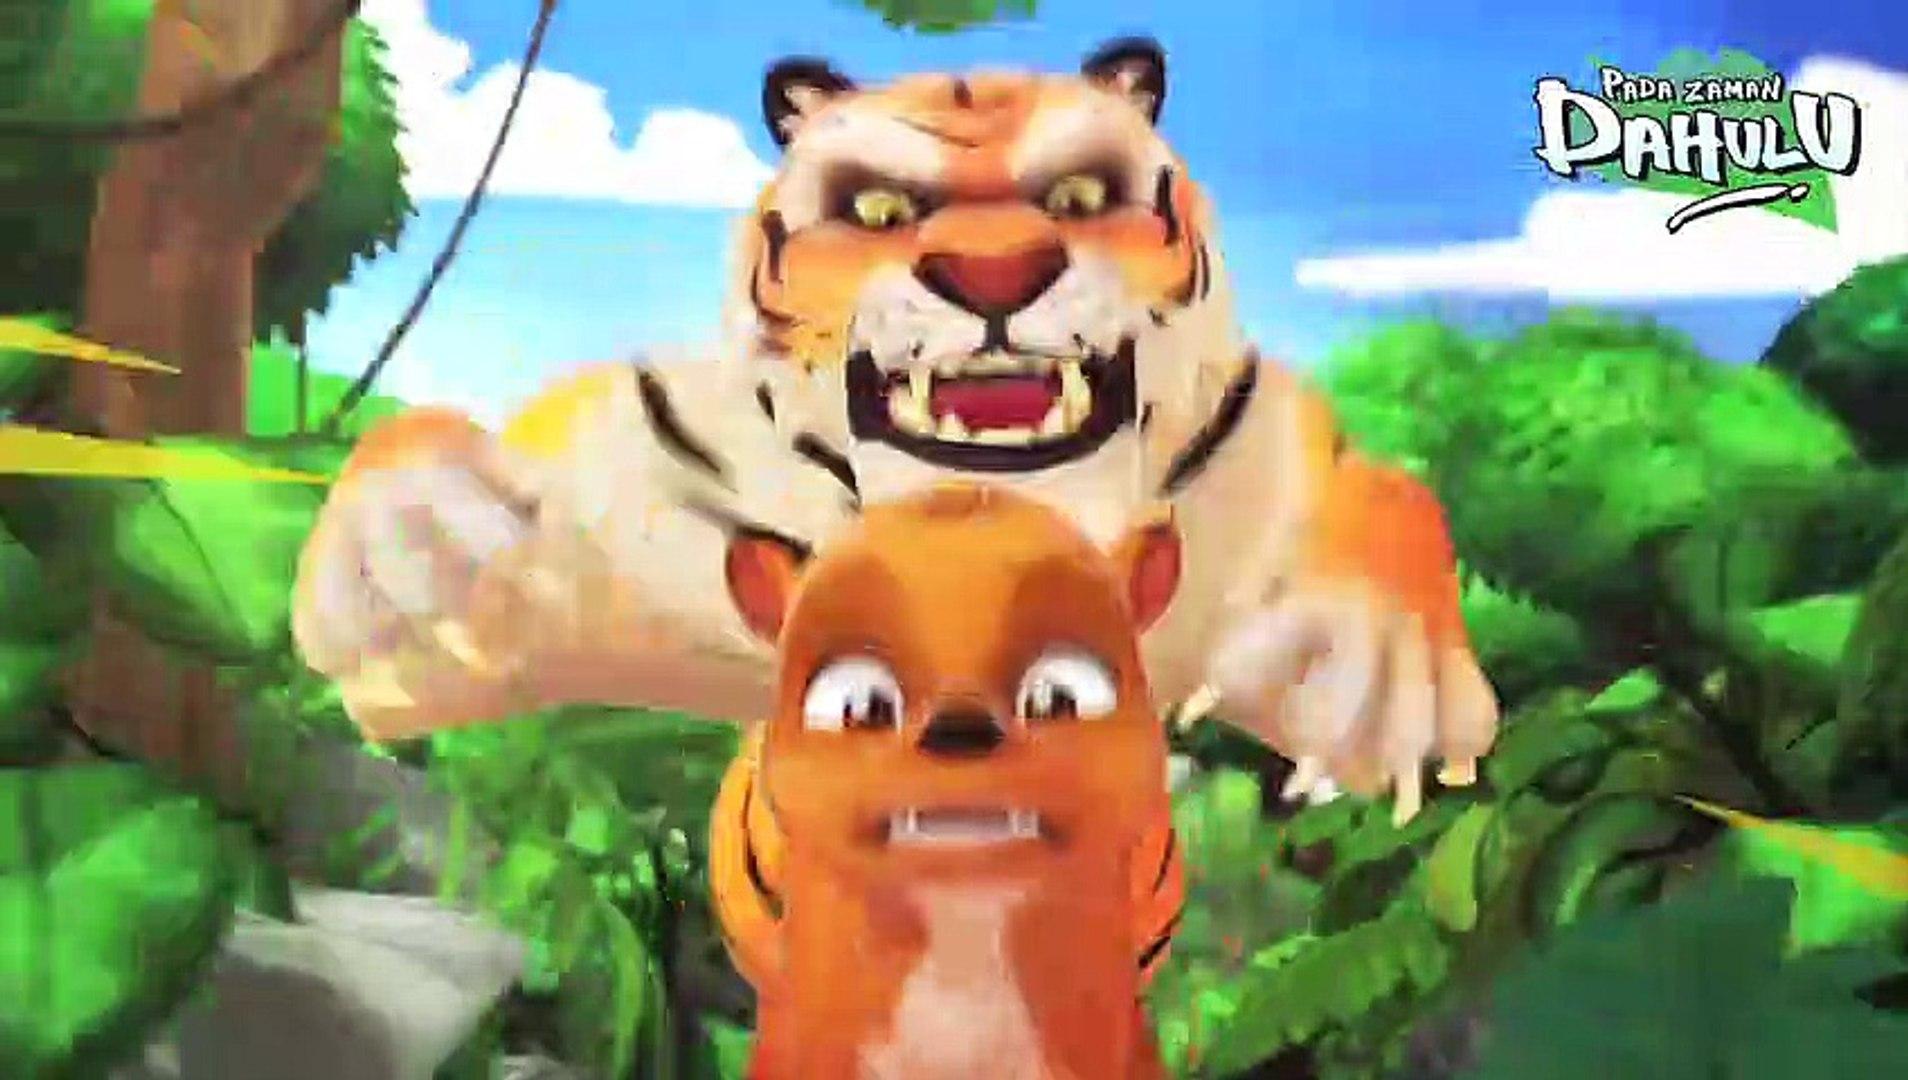 Cerita Aki Penghuni Hutan Harimau Terbaru Kartun Anak Anak Tv Hd 2019 Cinema Edy Action